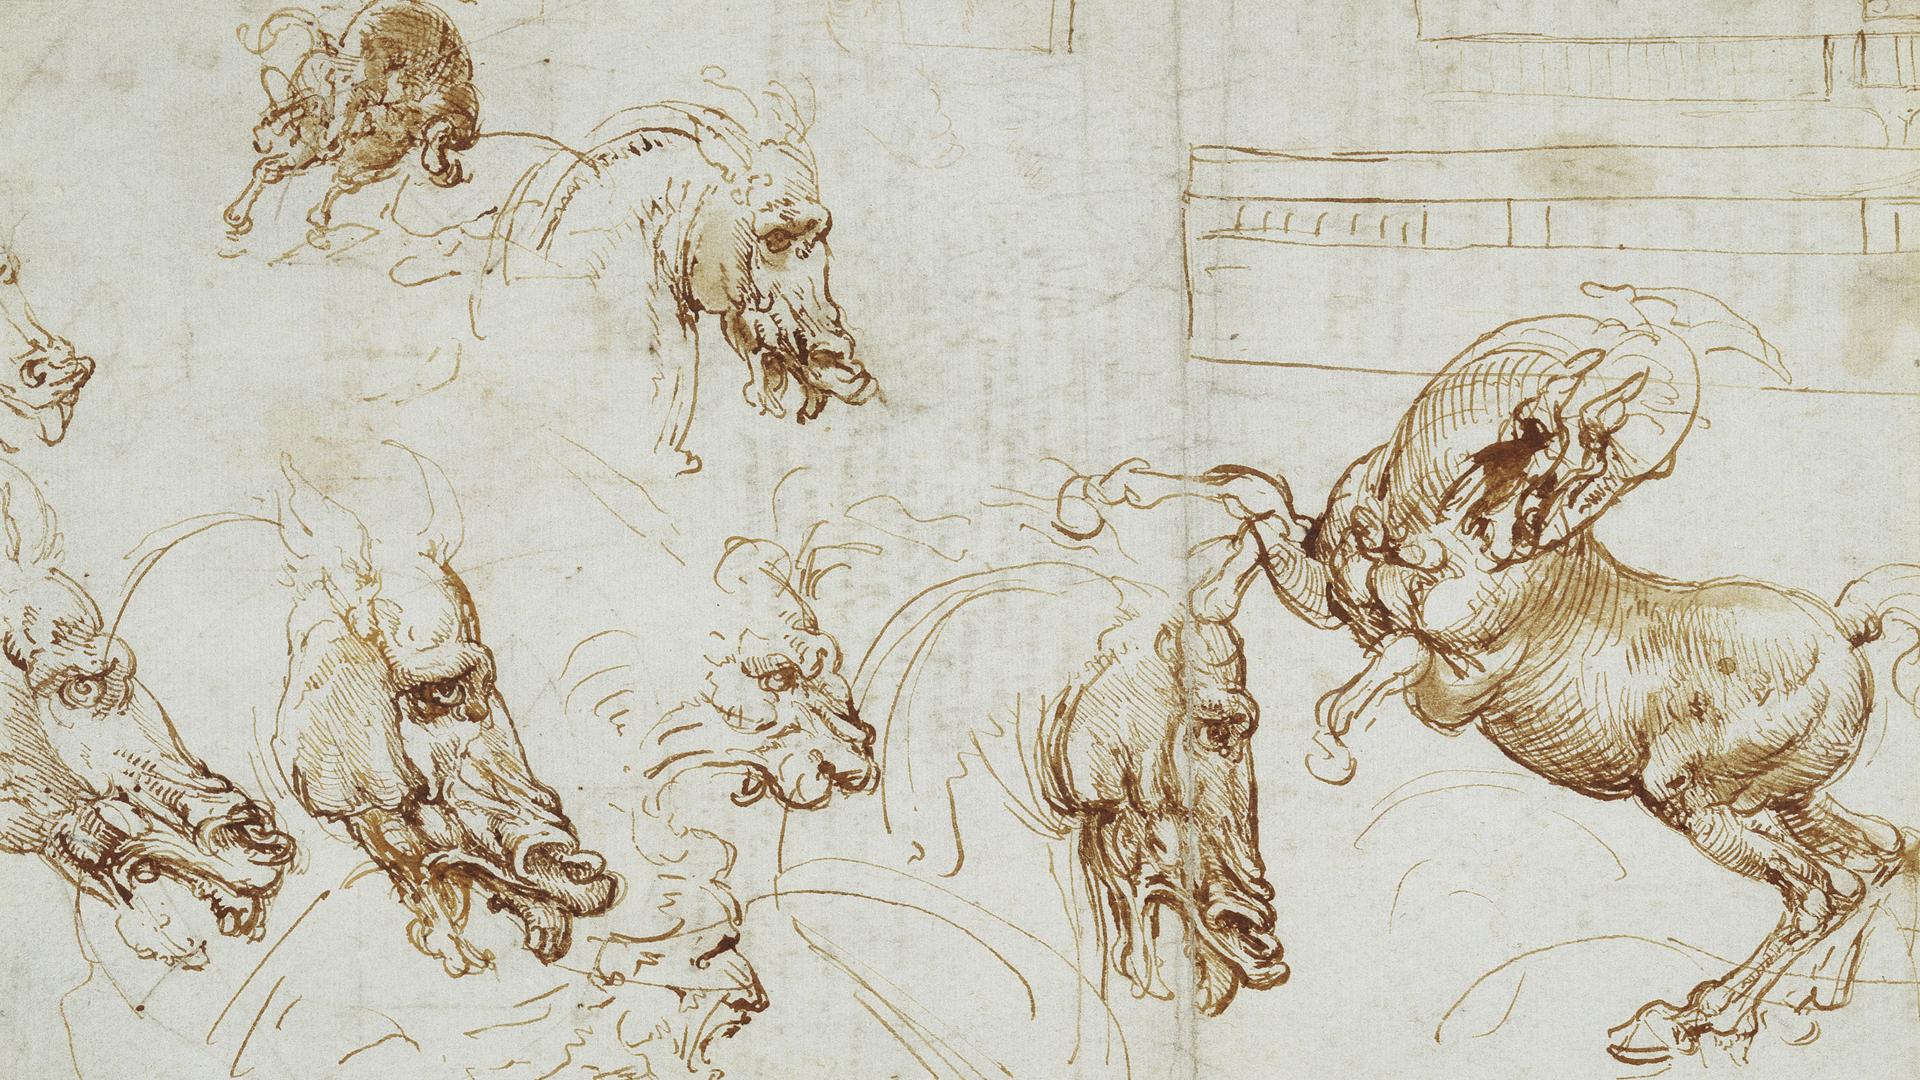 Leonardo – The Science behind the Art